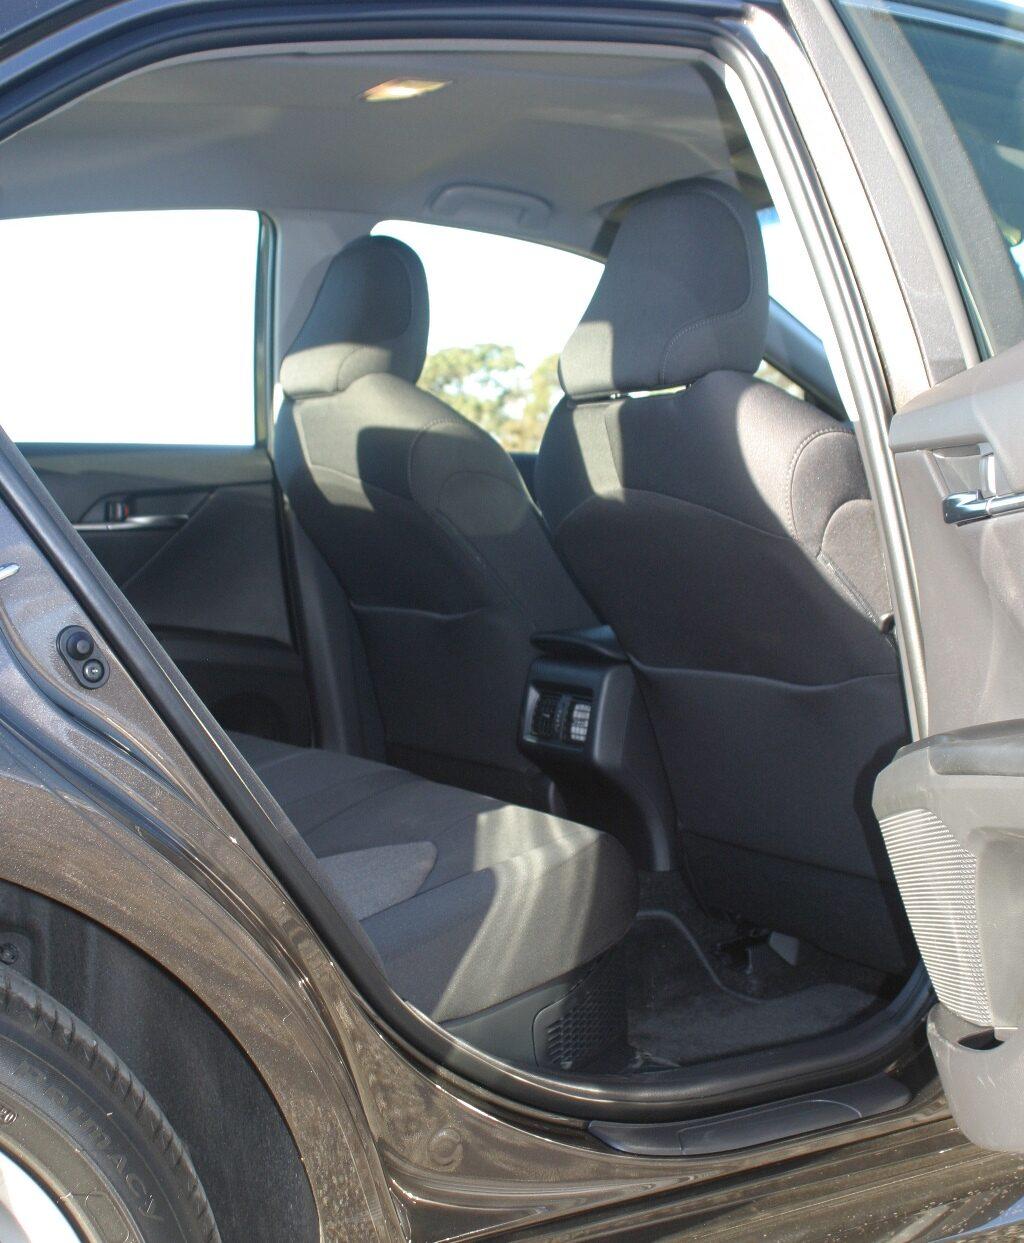 Toyota Camry Ascent Hybrid Rear legroom